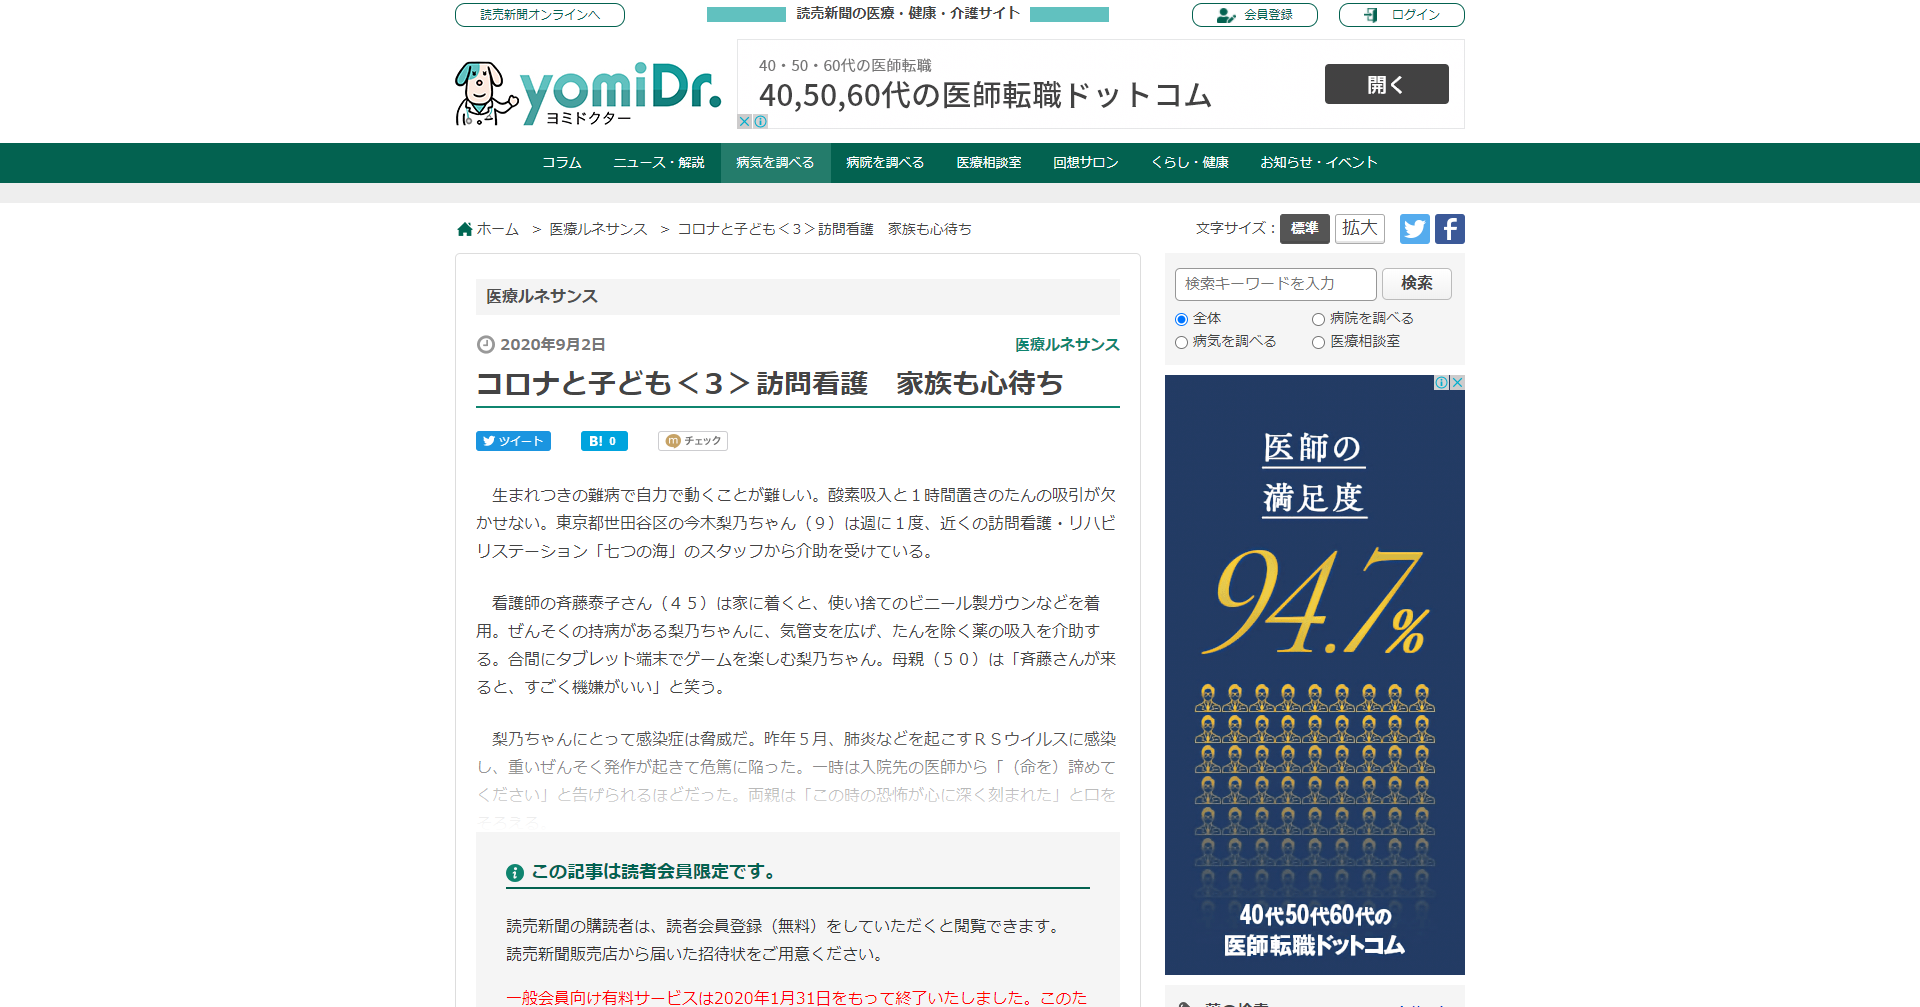 FireShot Capture 930 - コロナと子ども<3>訪問看護 家族も心待ち _ yomiDr._ヨミドクター(読売新聞) - yomidr.yomiuri.co.jp